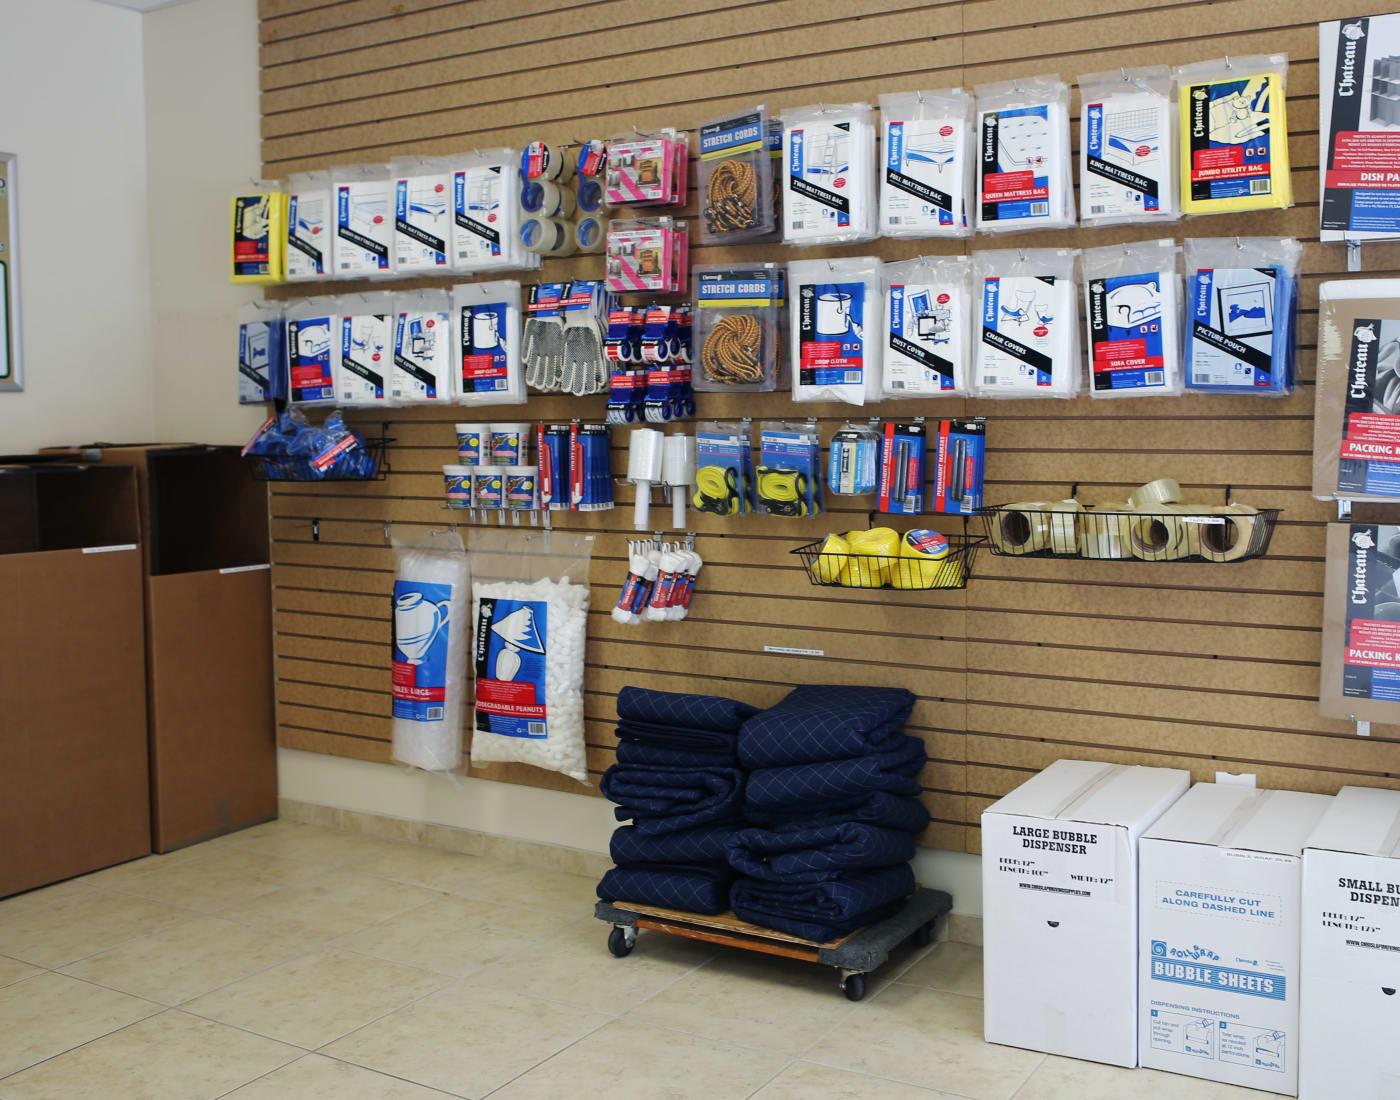 Leasing office at Midgard Self Storage in Bradenton, Florida